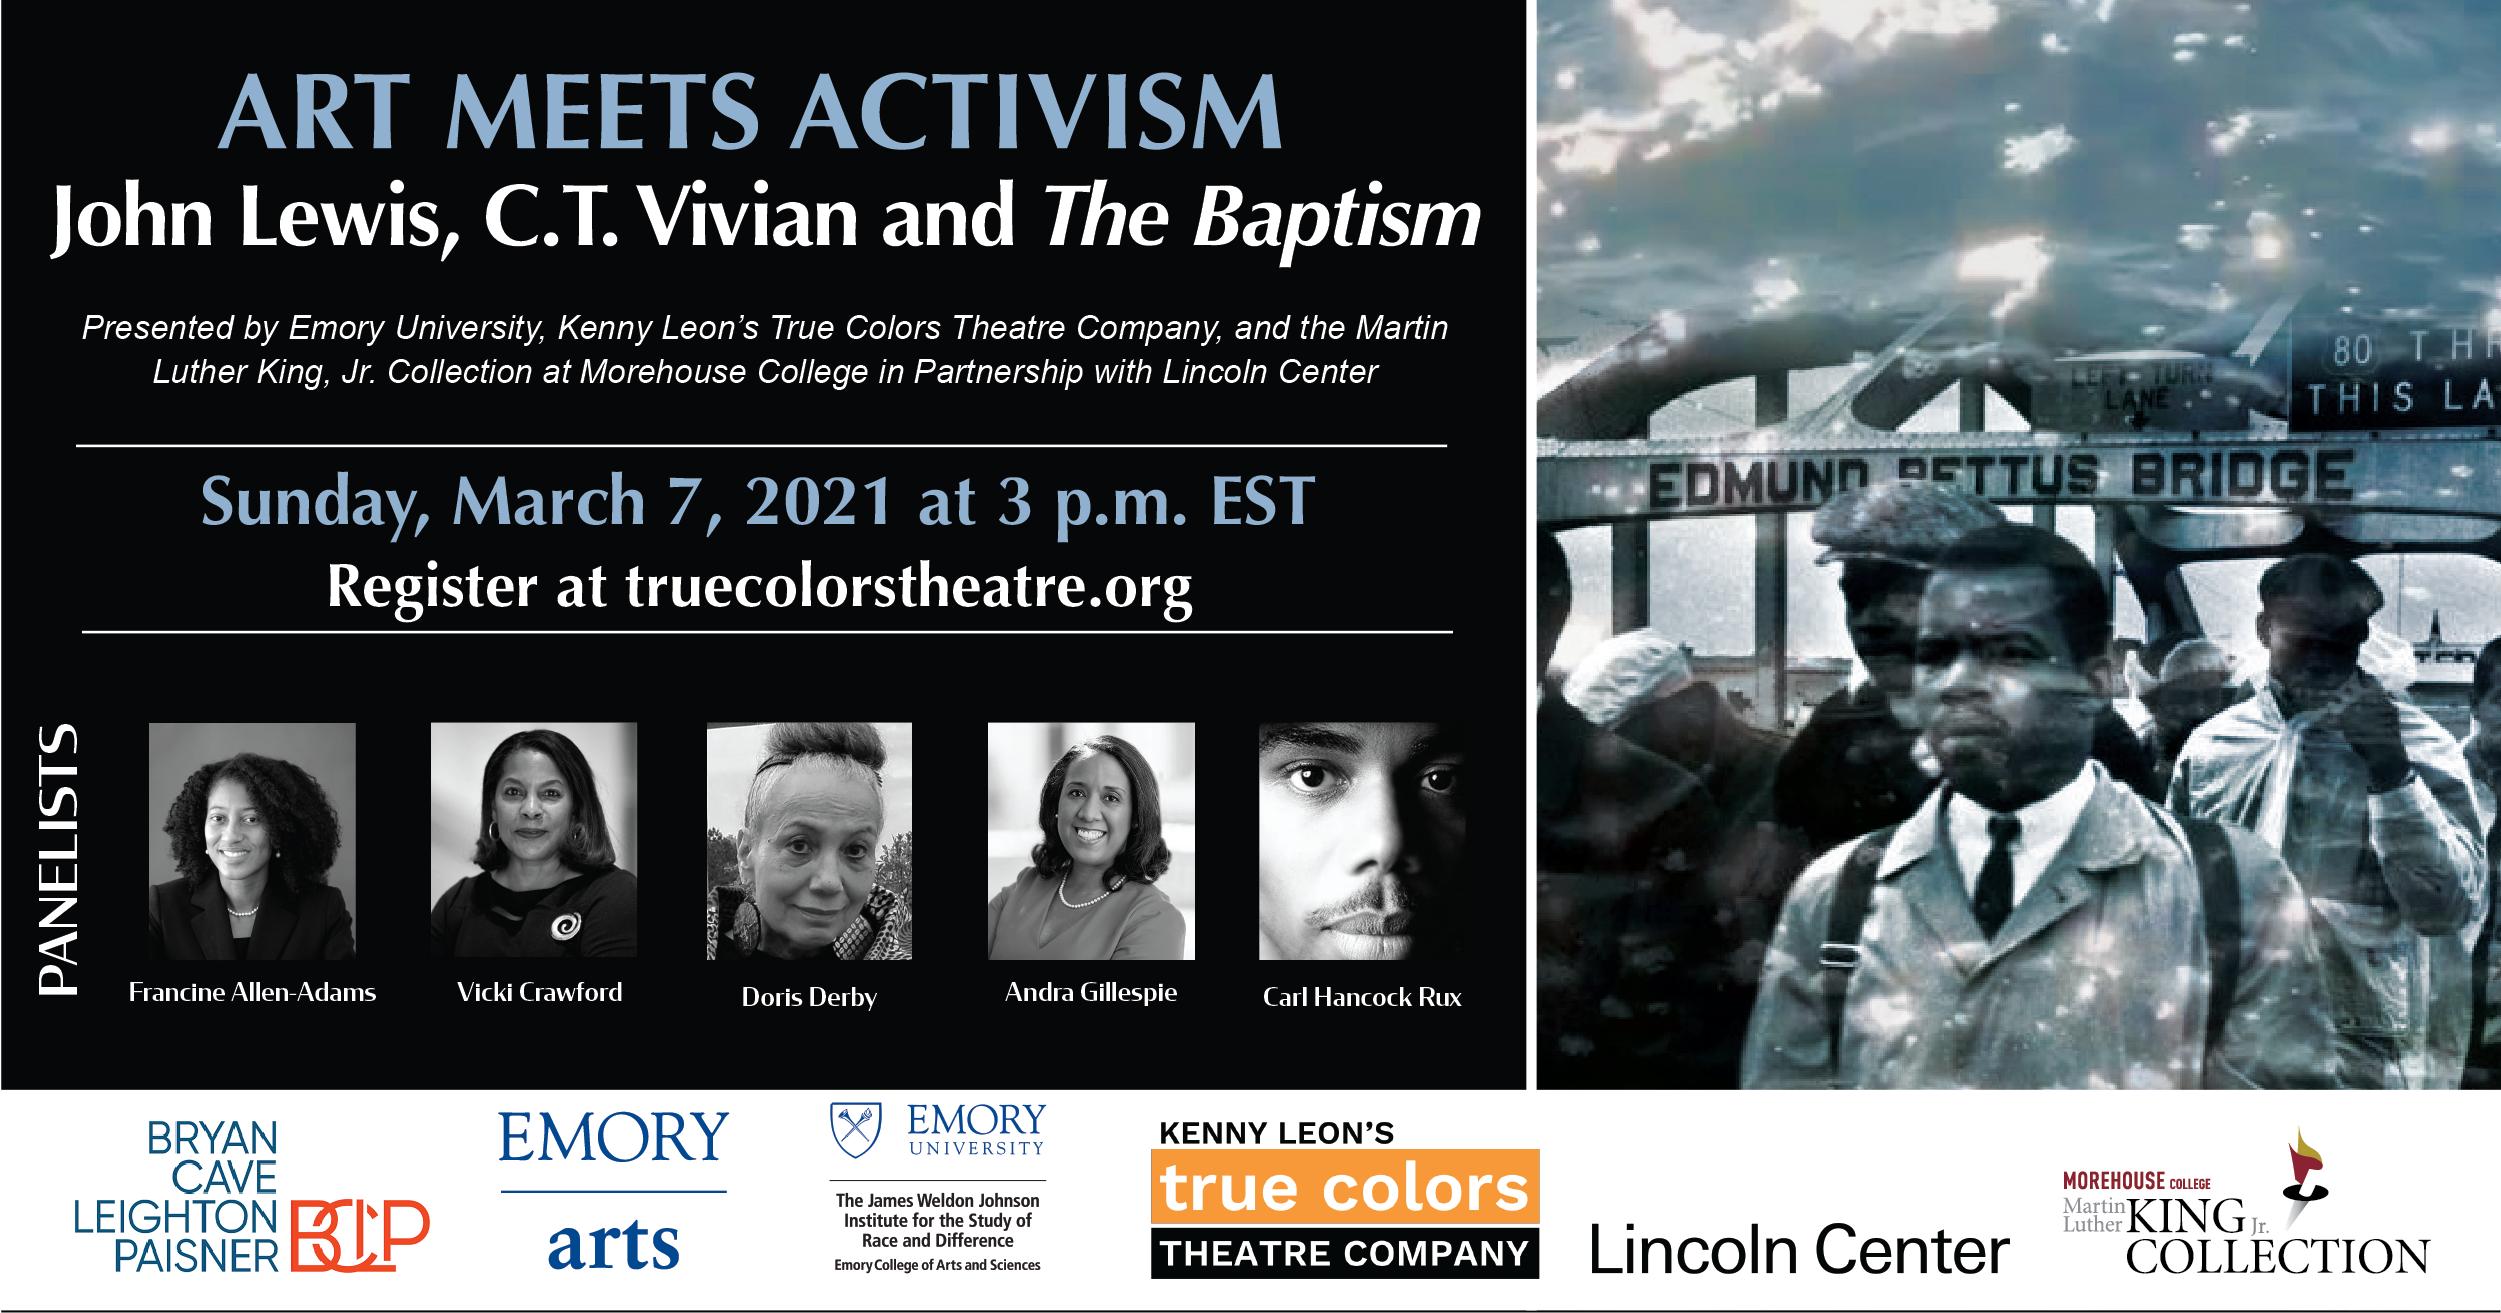 Art Meets Activism: John Lewis, C.T. Vivian, and The Baptism